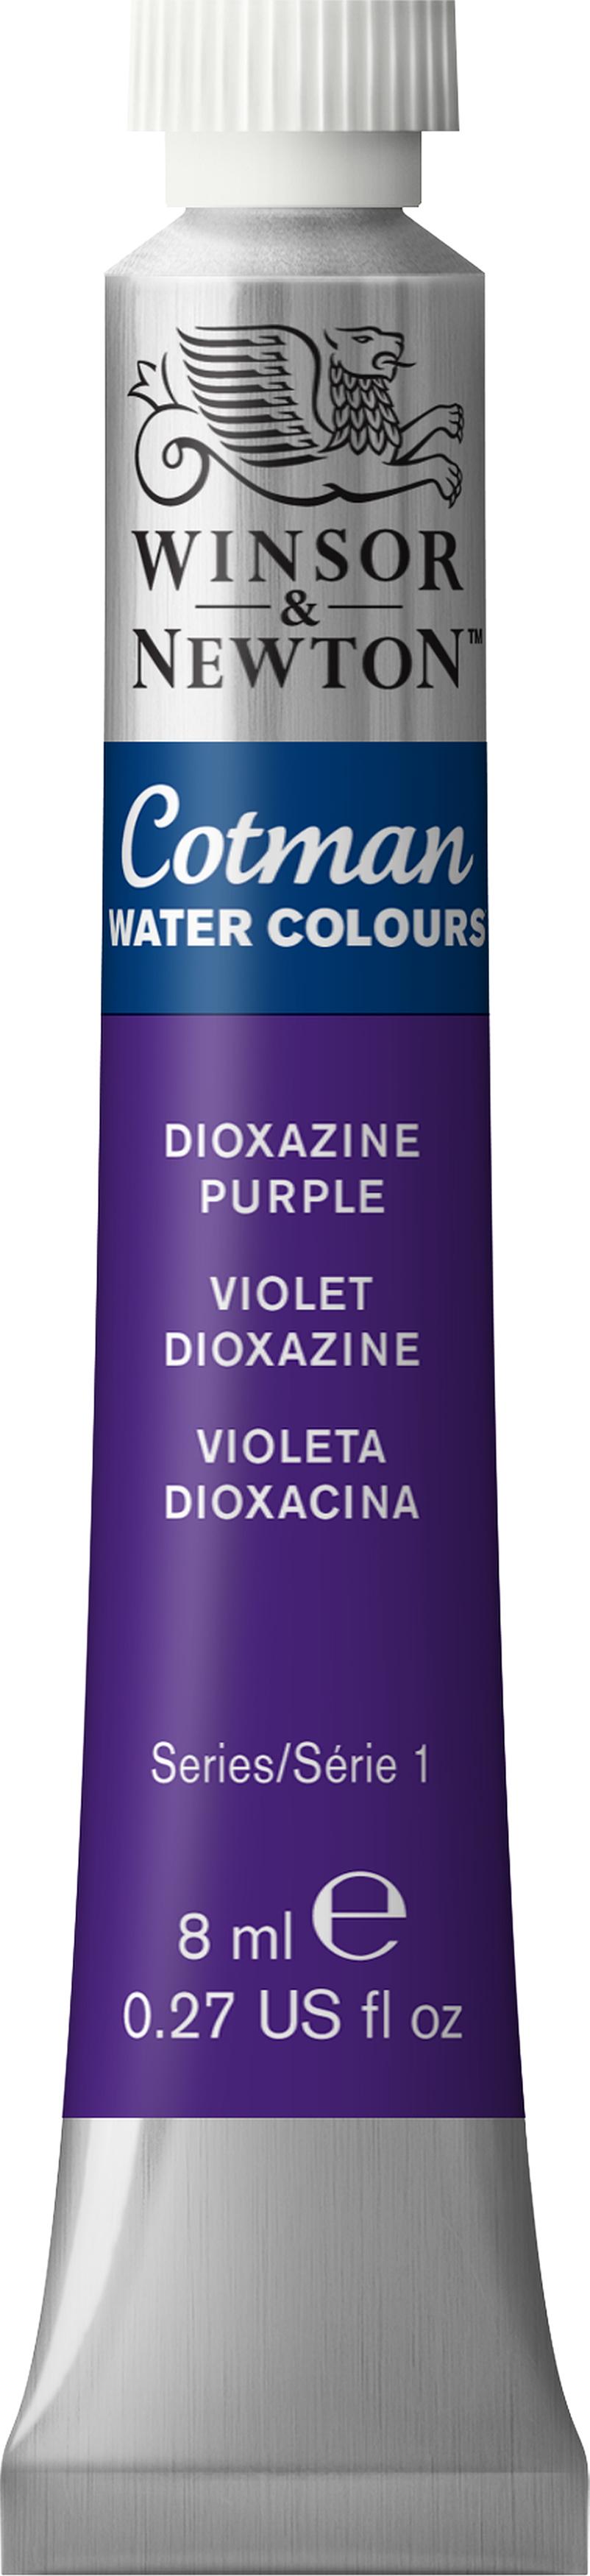 Winsor & Newton Cotman Water Colours 8ml-Dioxazine Violet